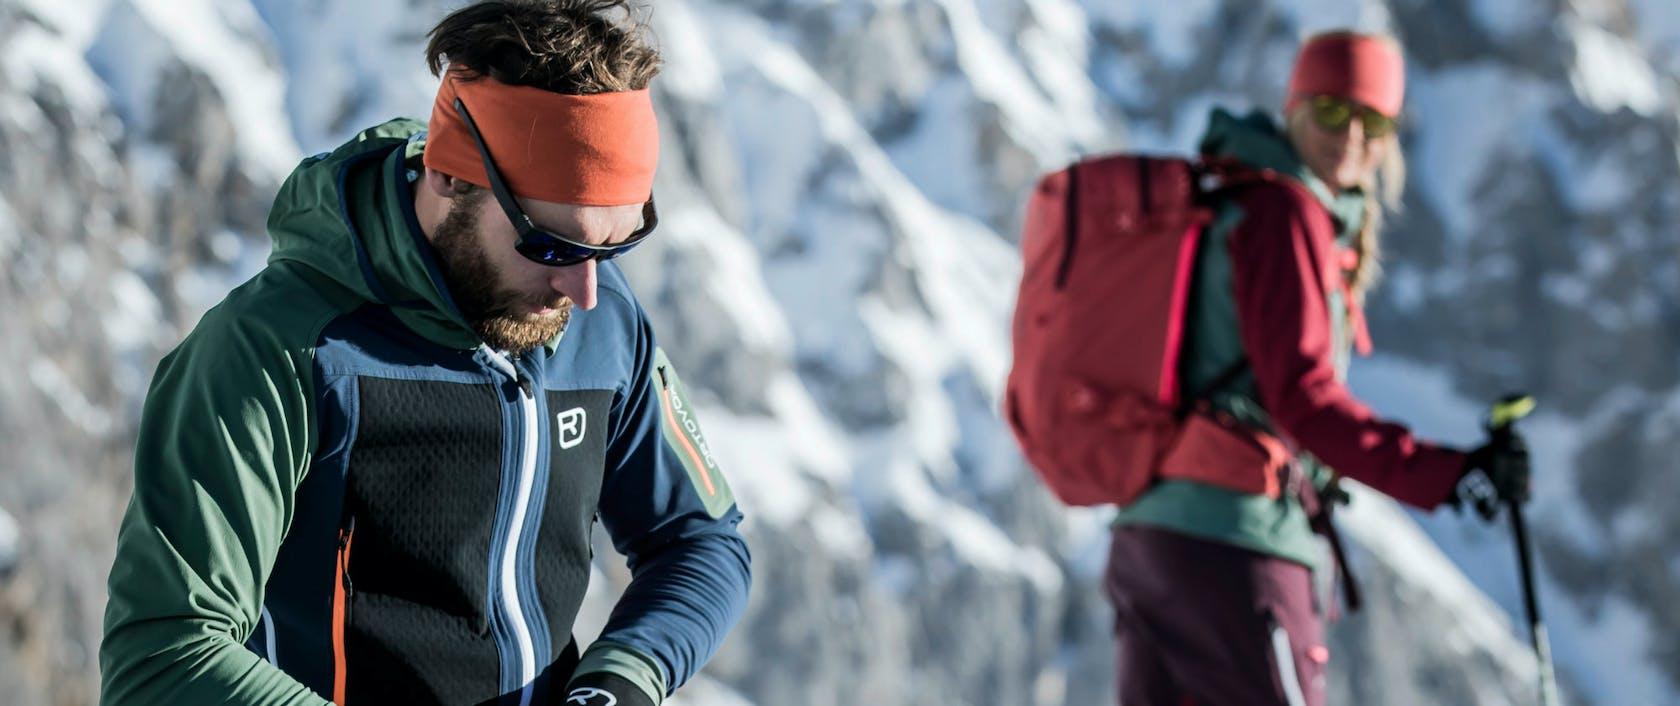 ortovox skitouren rucksack